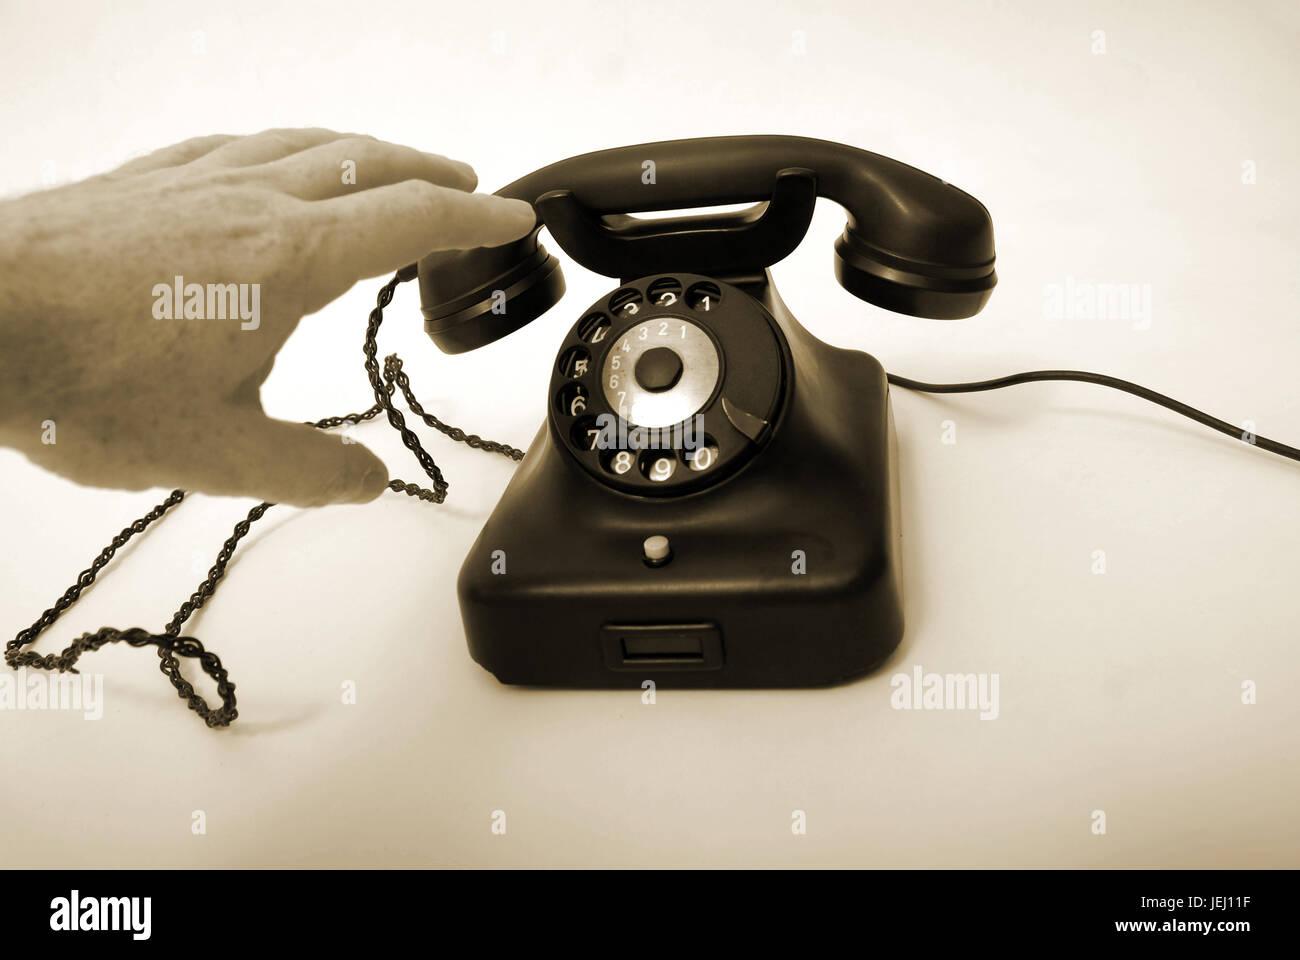 Communications - Stock Image